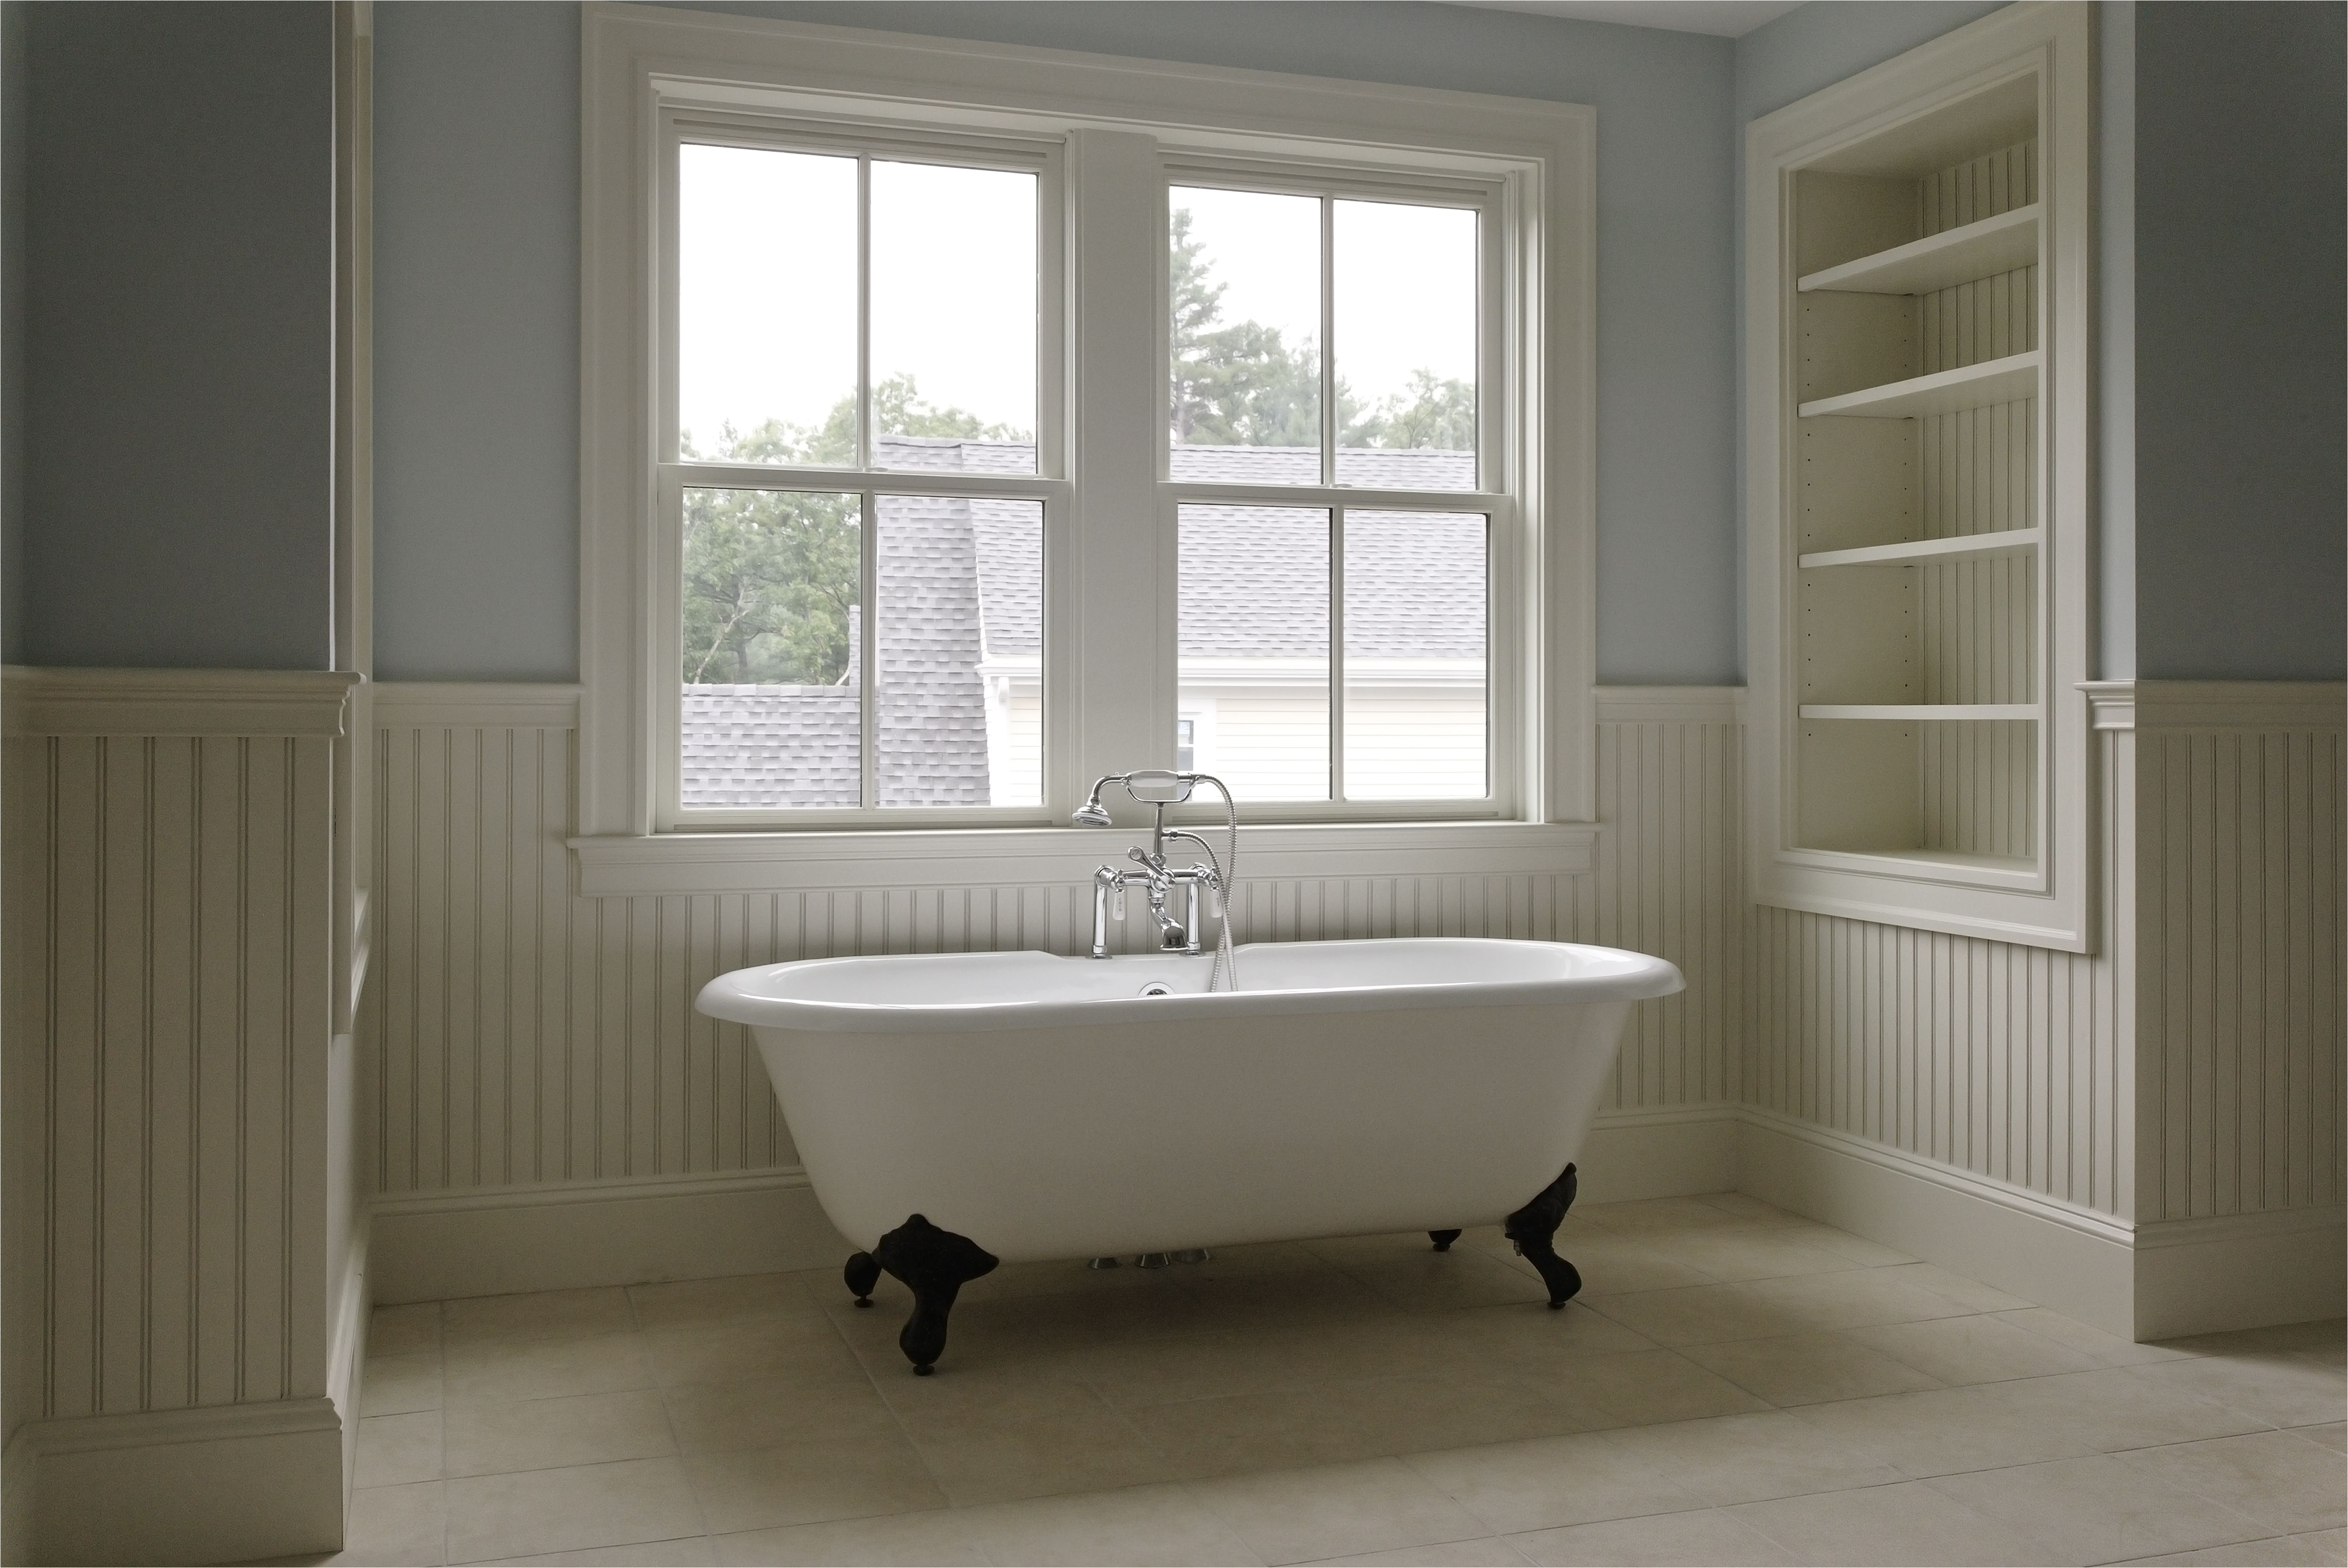 tradional style bathroom with clawfoot tub 133600769 582c8e5d3df78c6f6a4f5d3f